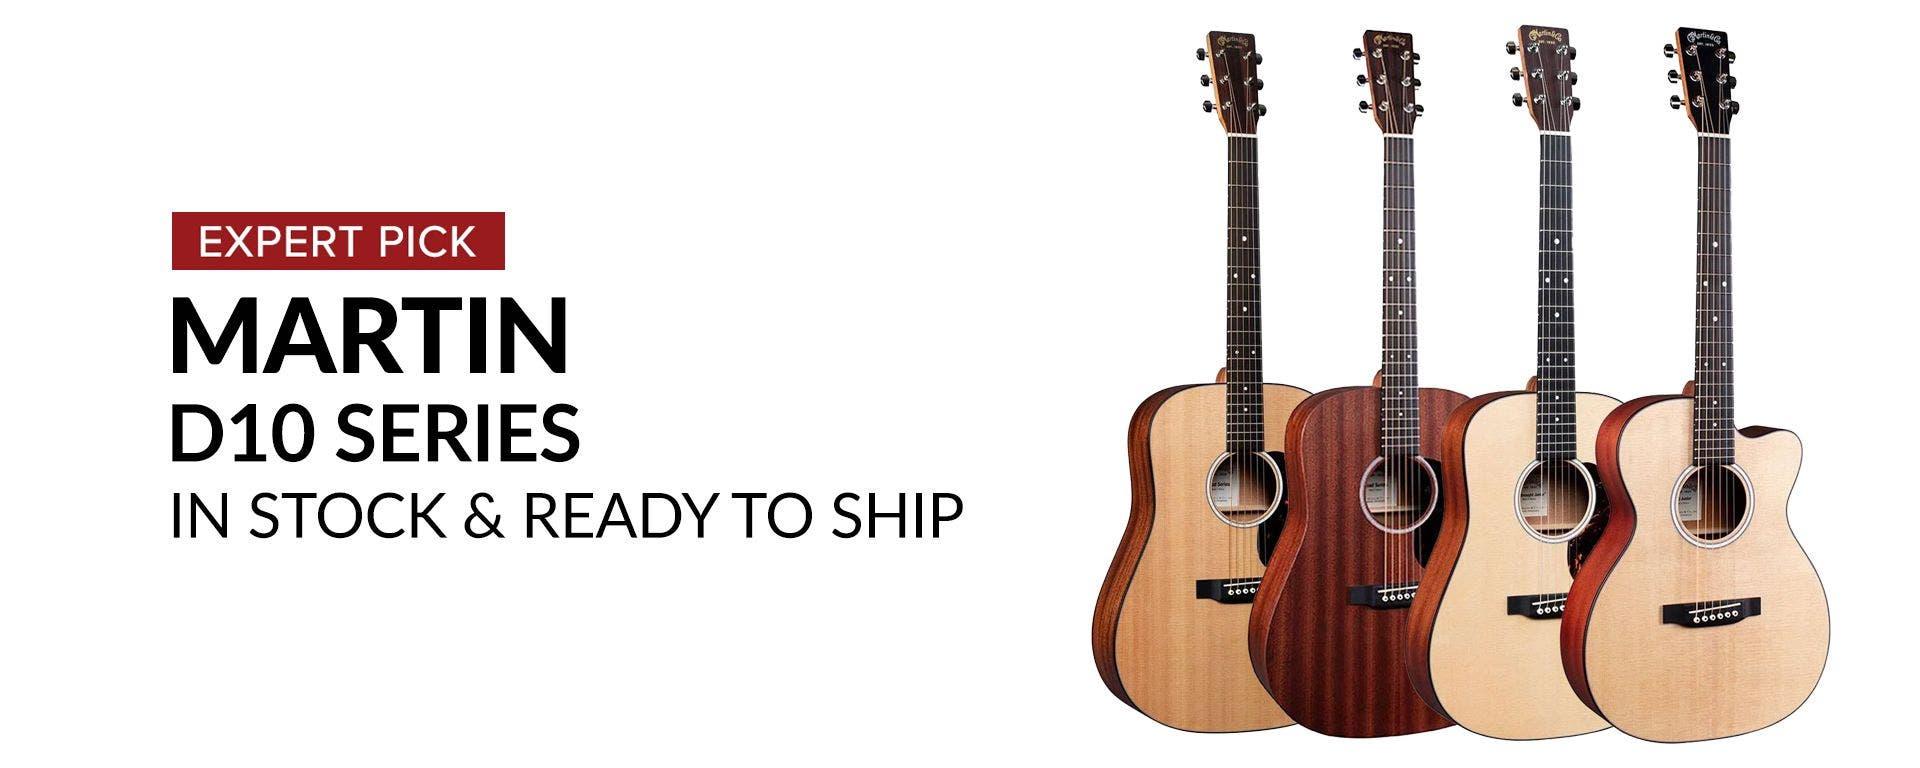 Shop Martin D-10 Series Guitars at Sam Ash